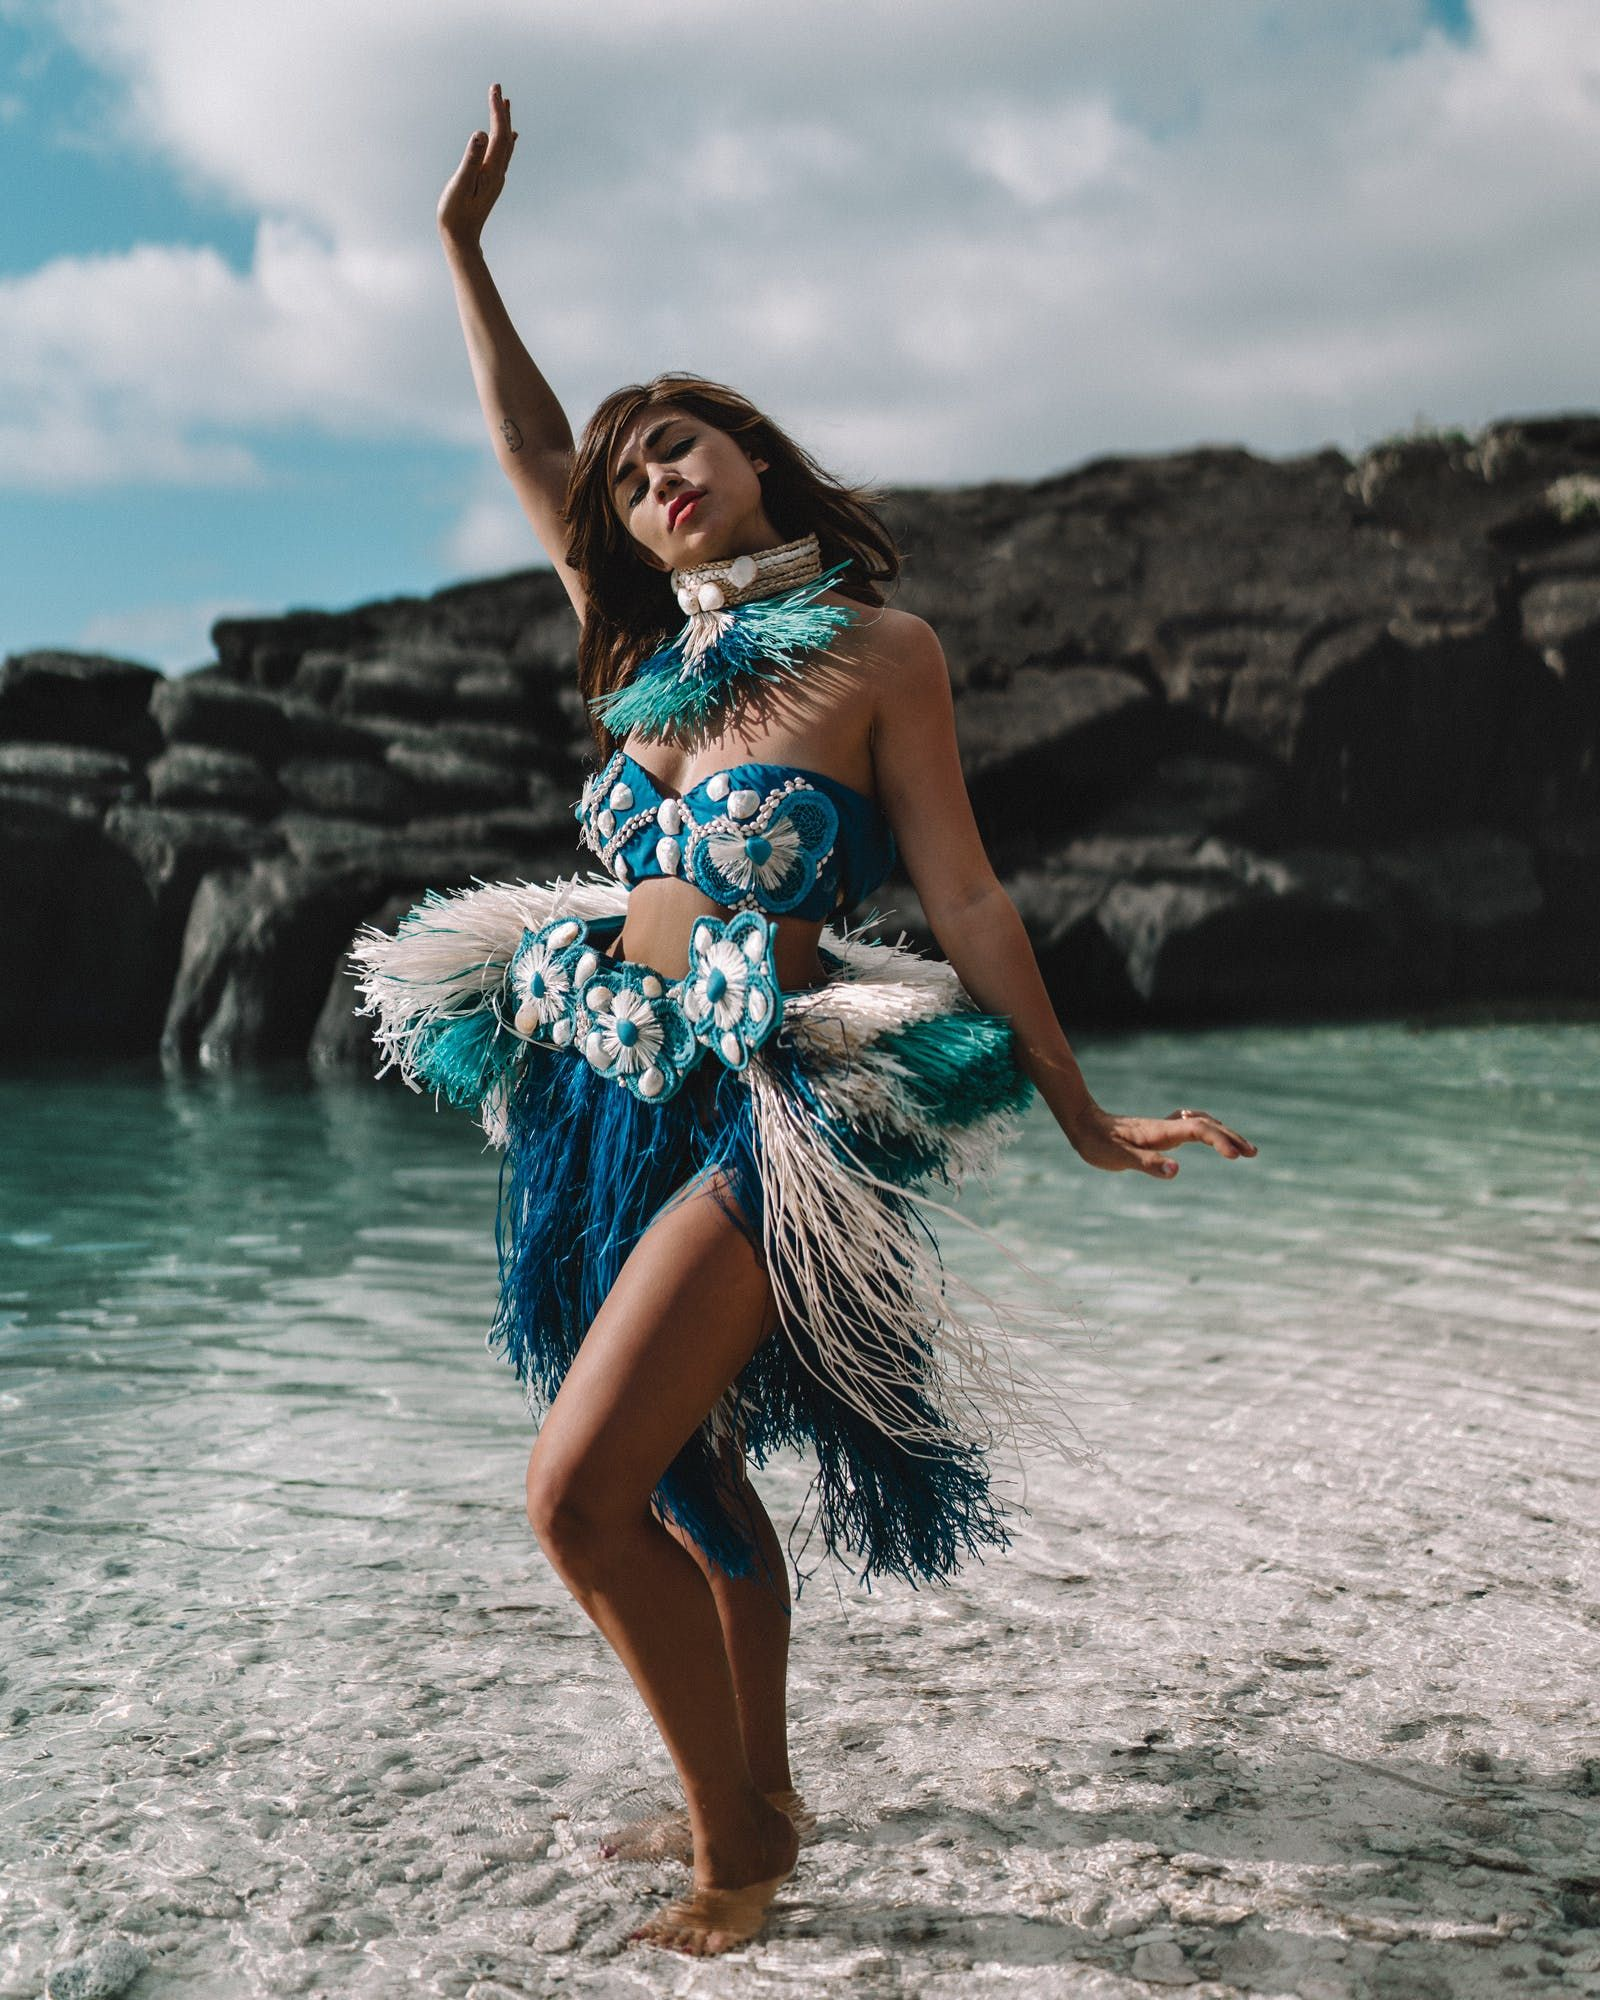 Cook Islands Best Beaches: The Rarotonga, Cook Islands Travel Guide